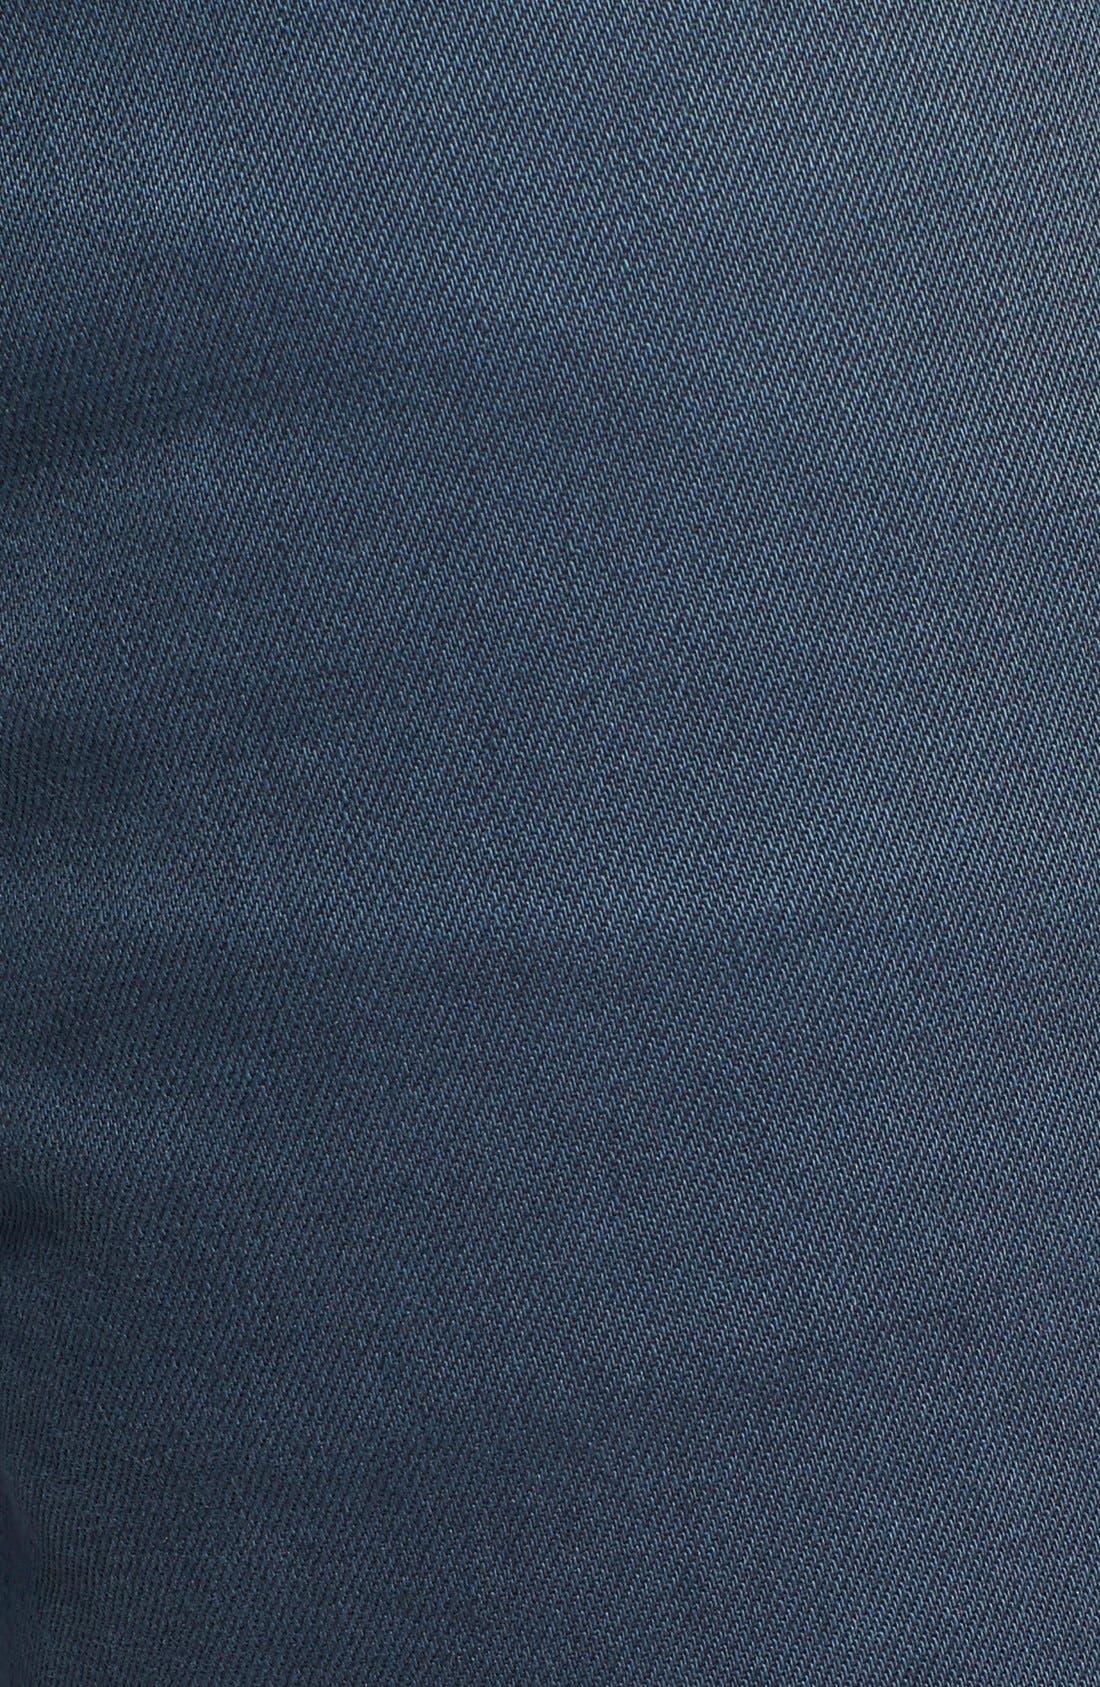 Alternate Image 5  - RVCA 'Daggers' Slim Fit Jeans (Army Drab)